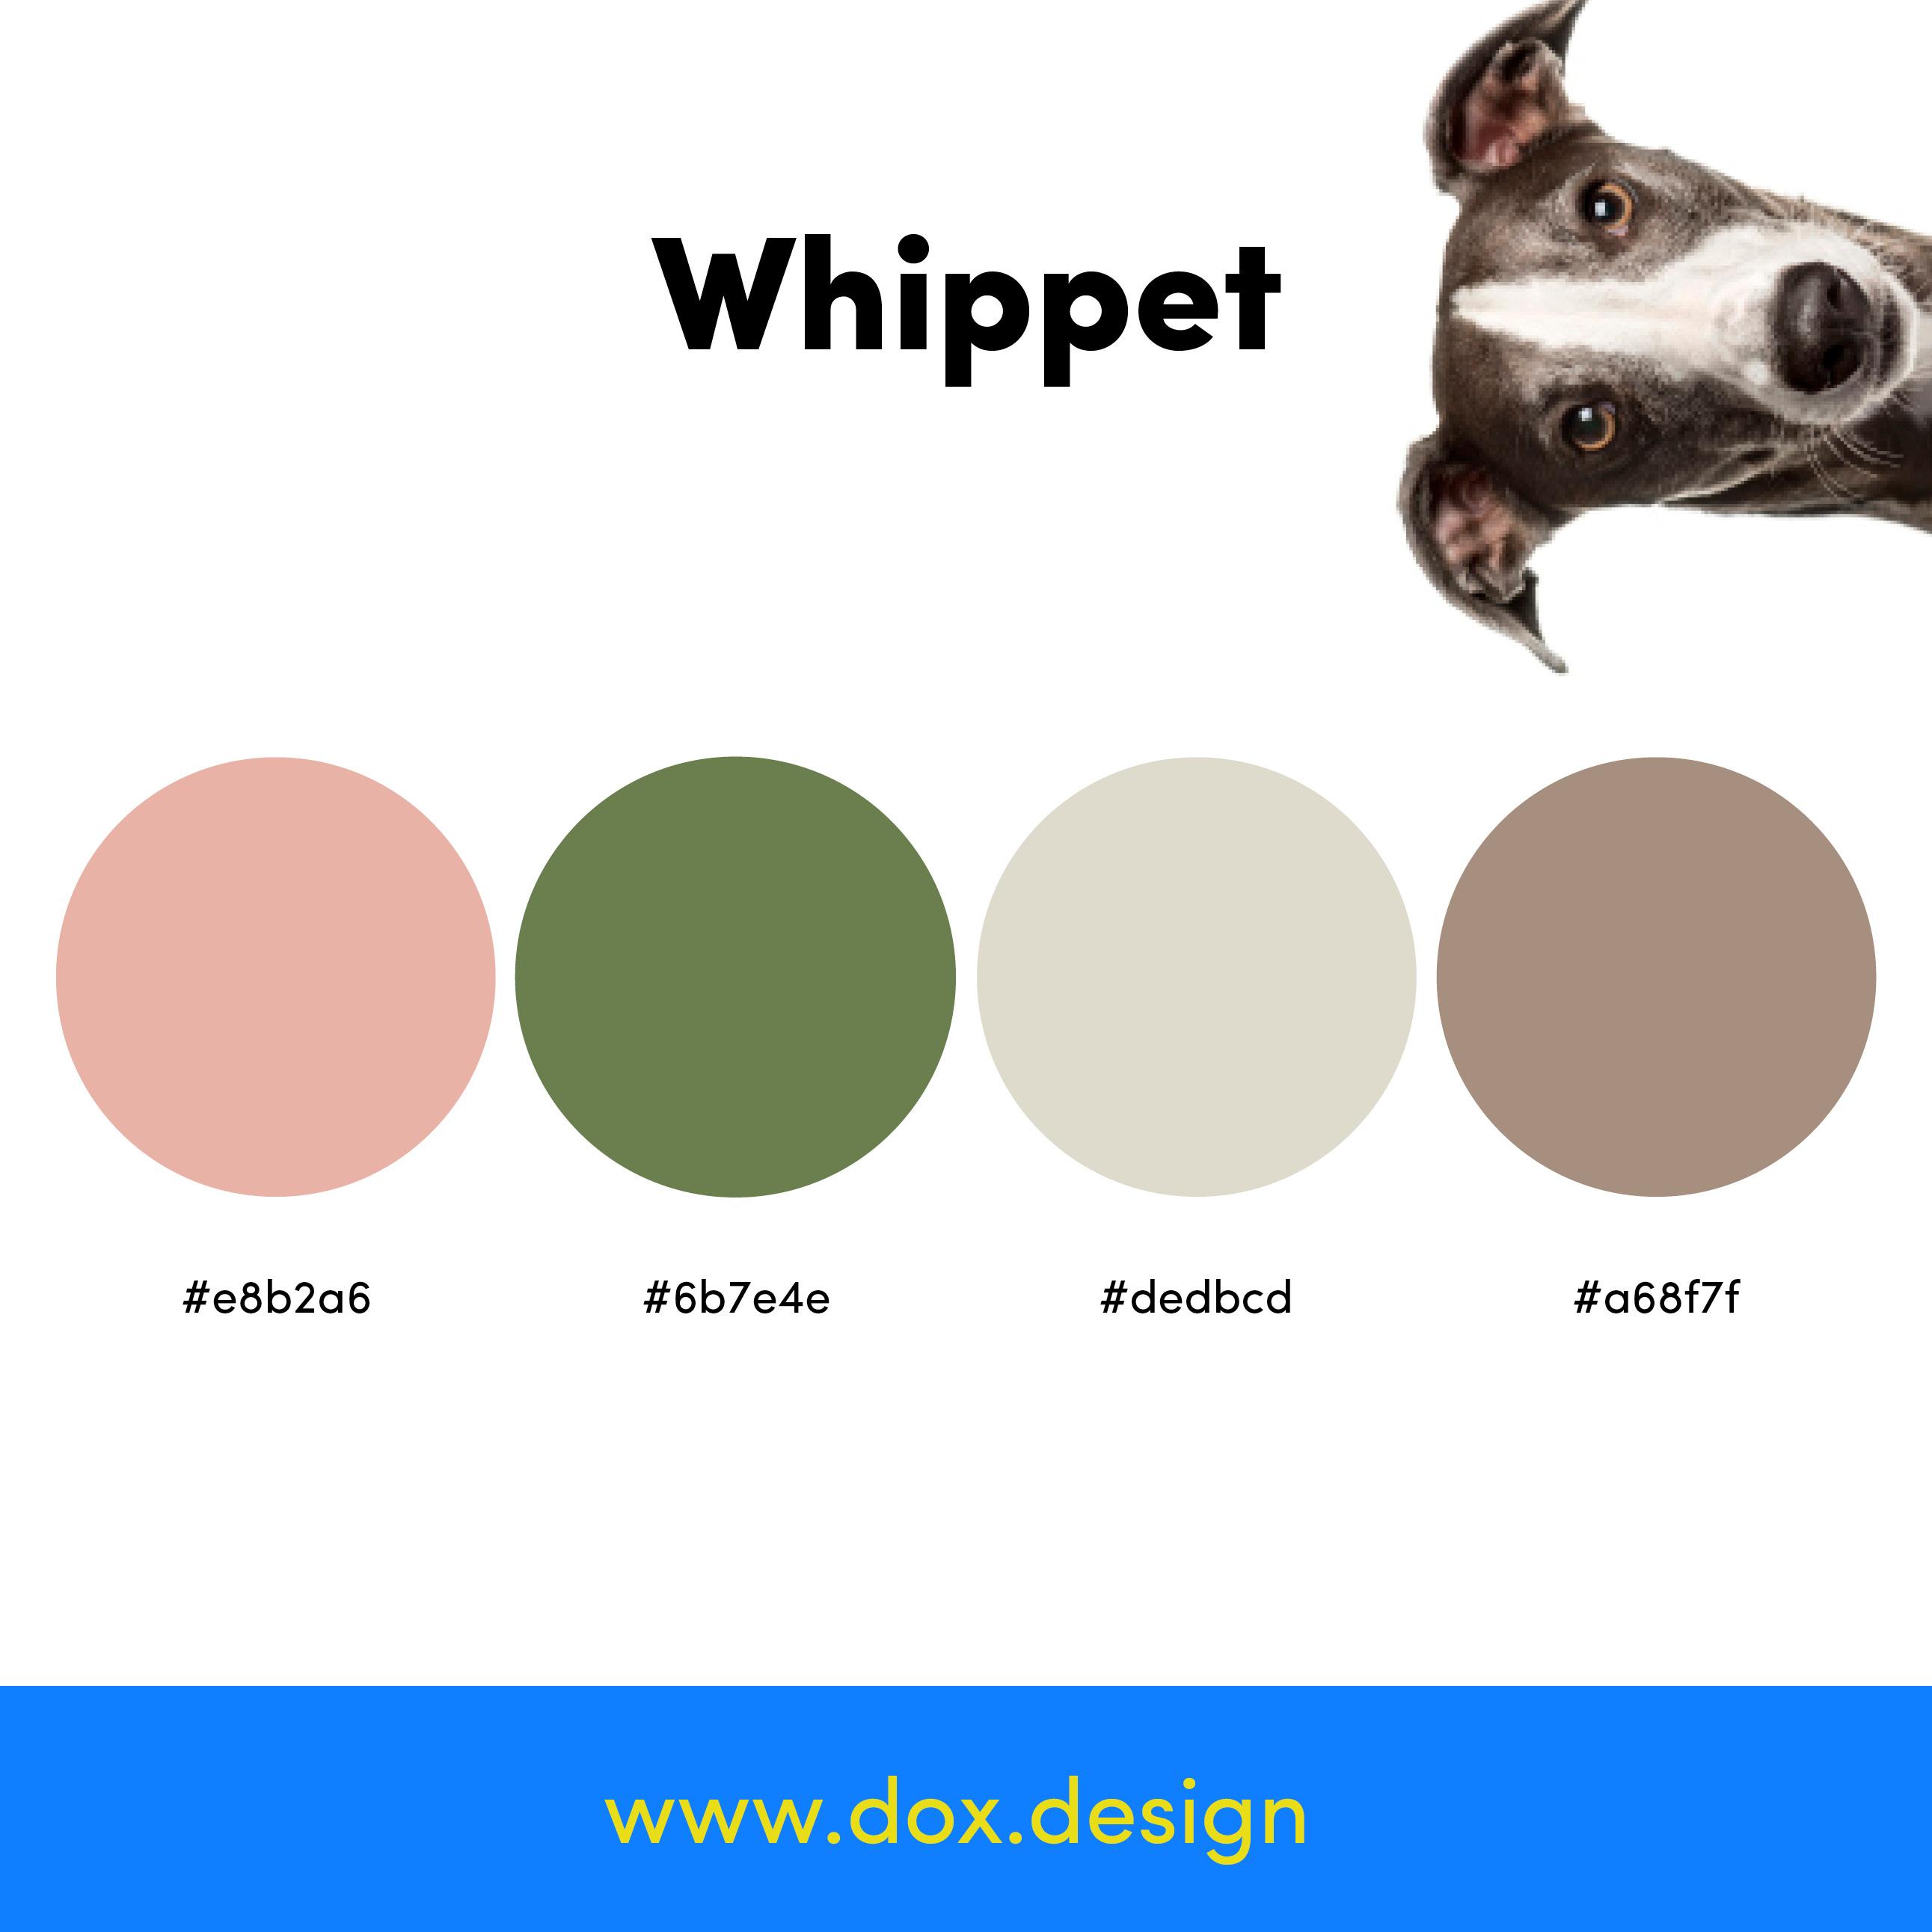 Whippet color palette